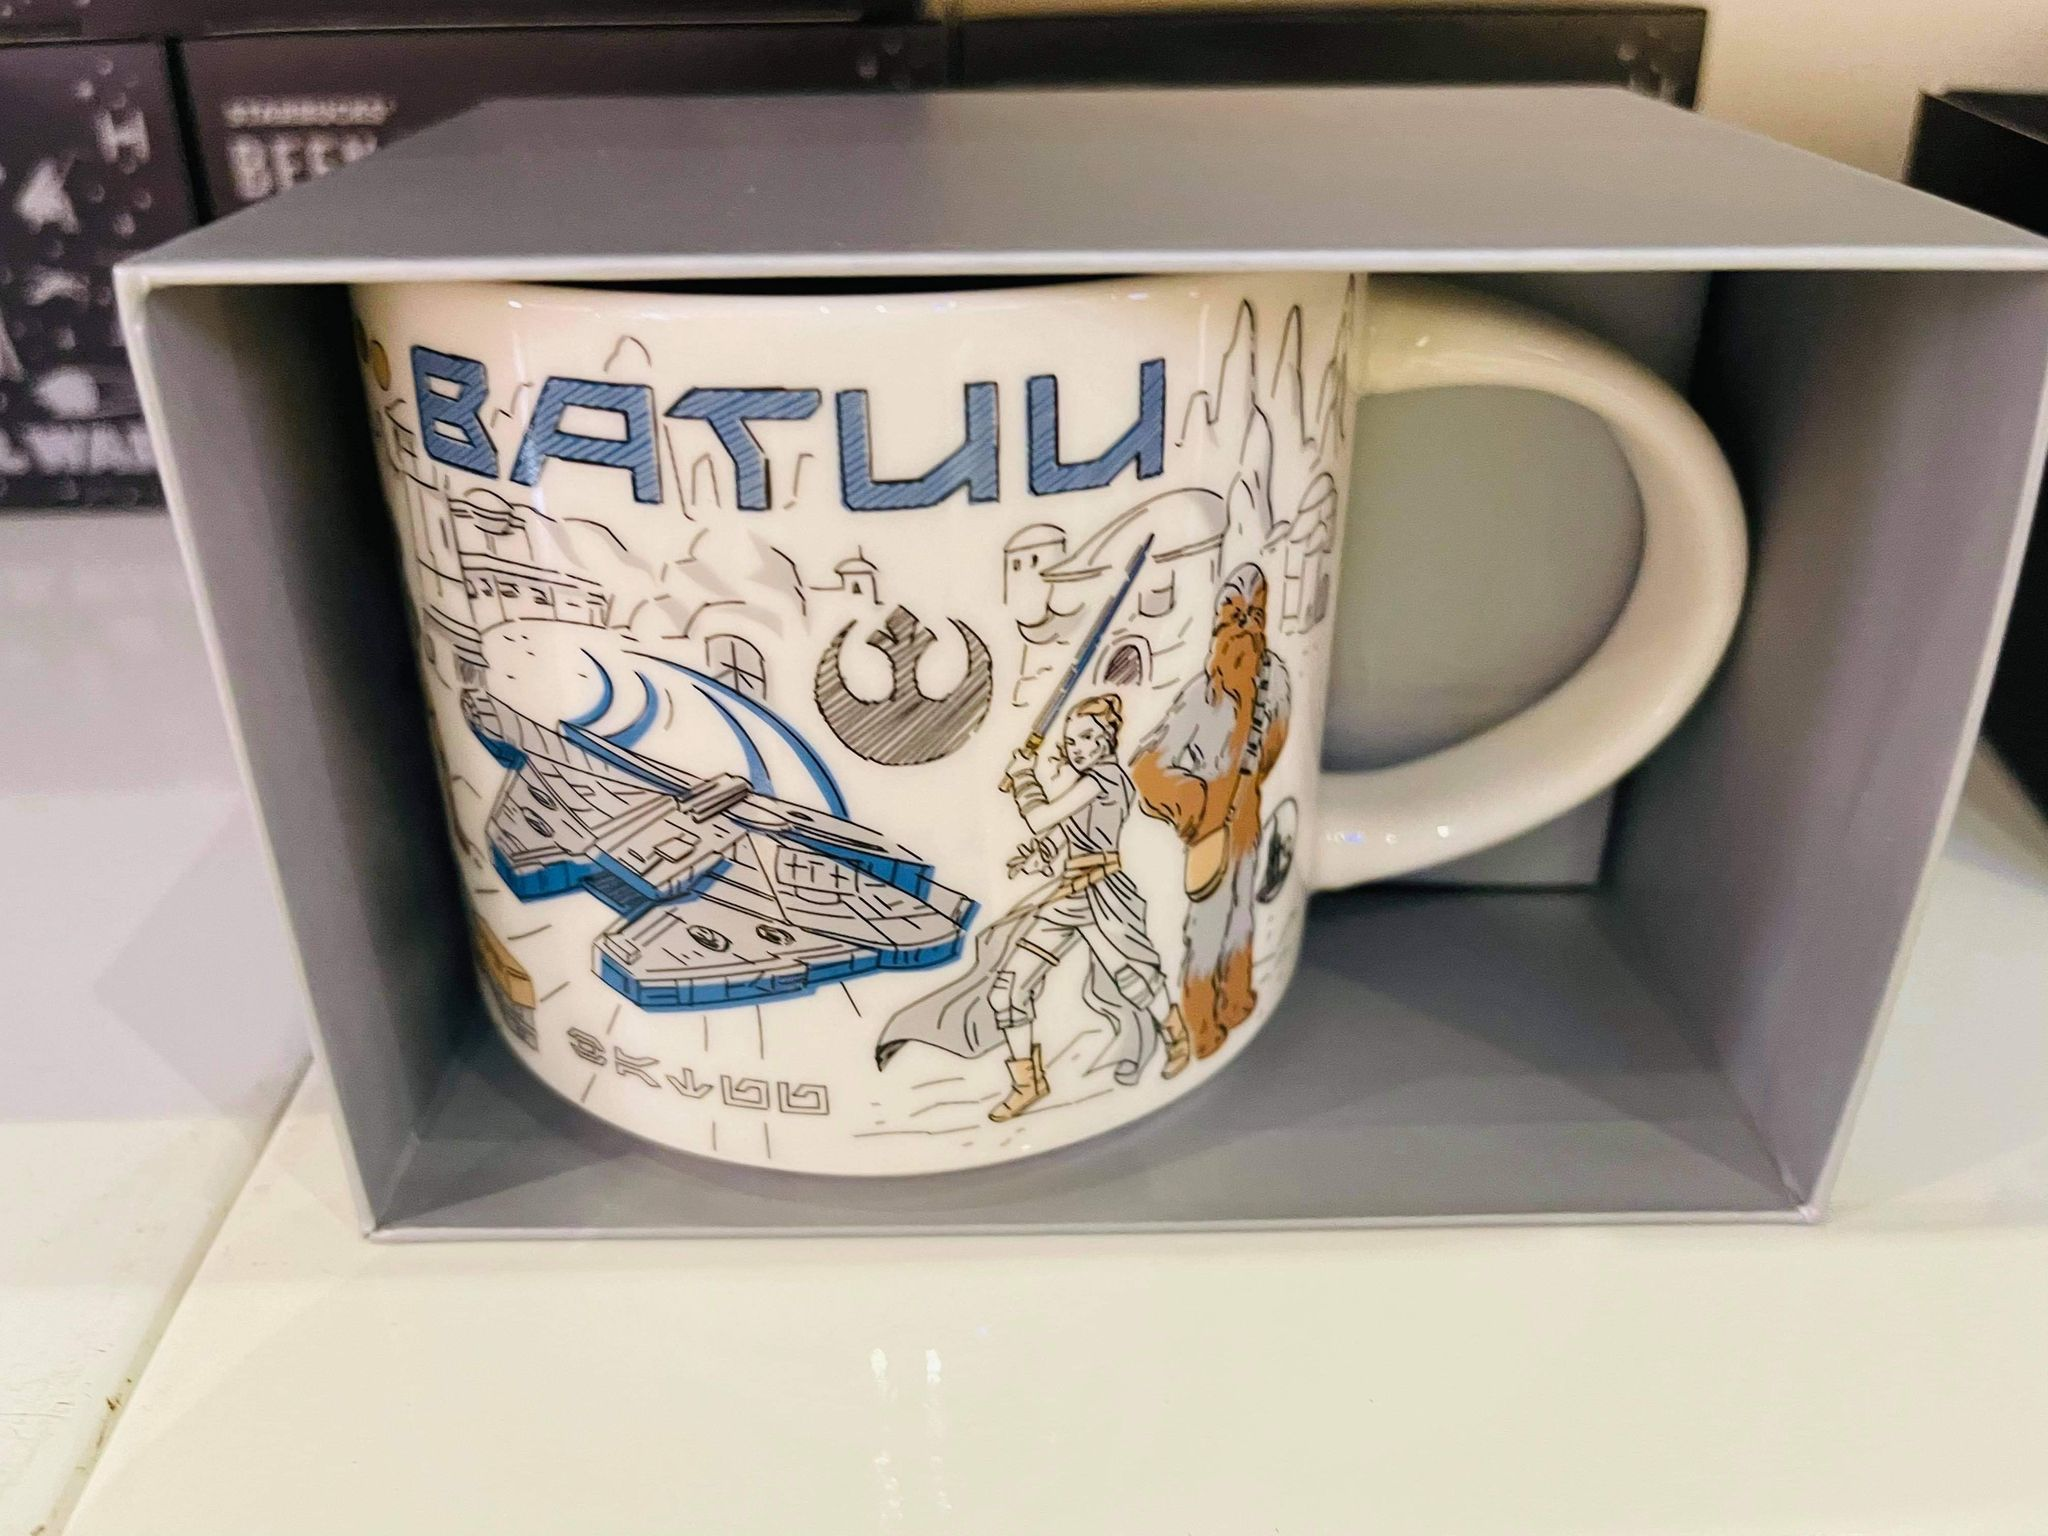 Batuu Starbucks mug